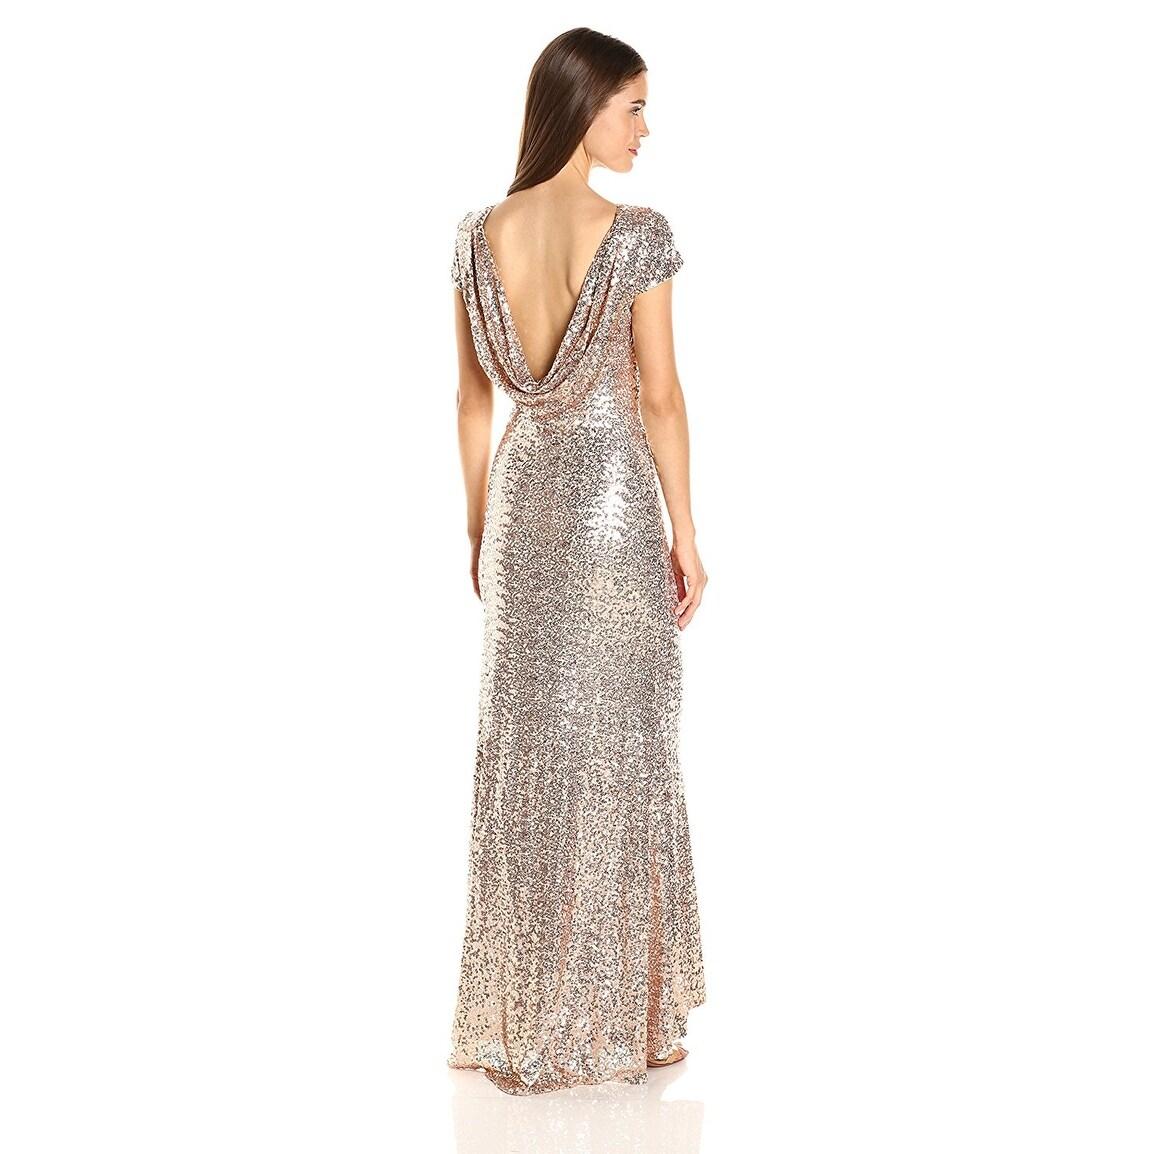 Shop Badgley Mischka Blush Cap Sleeve Sequin Cowl Back Evening Gown